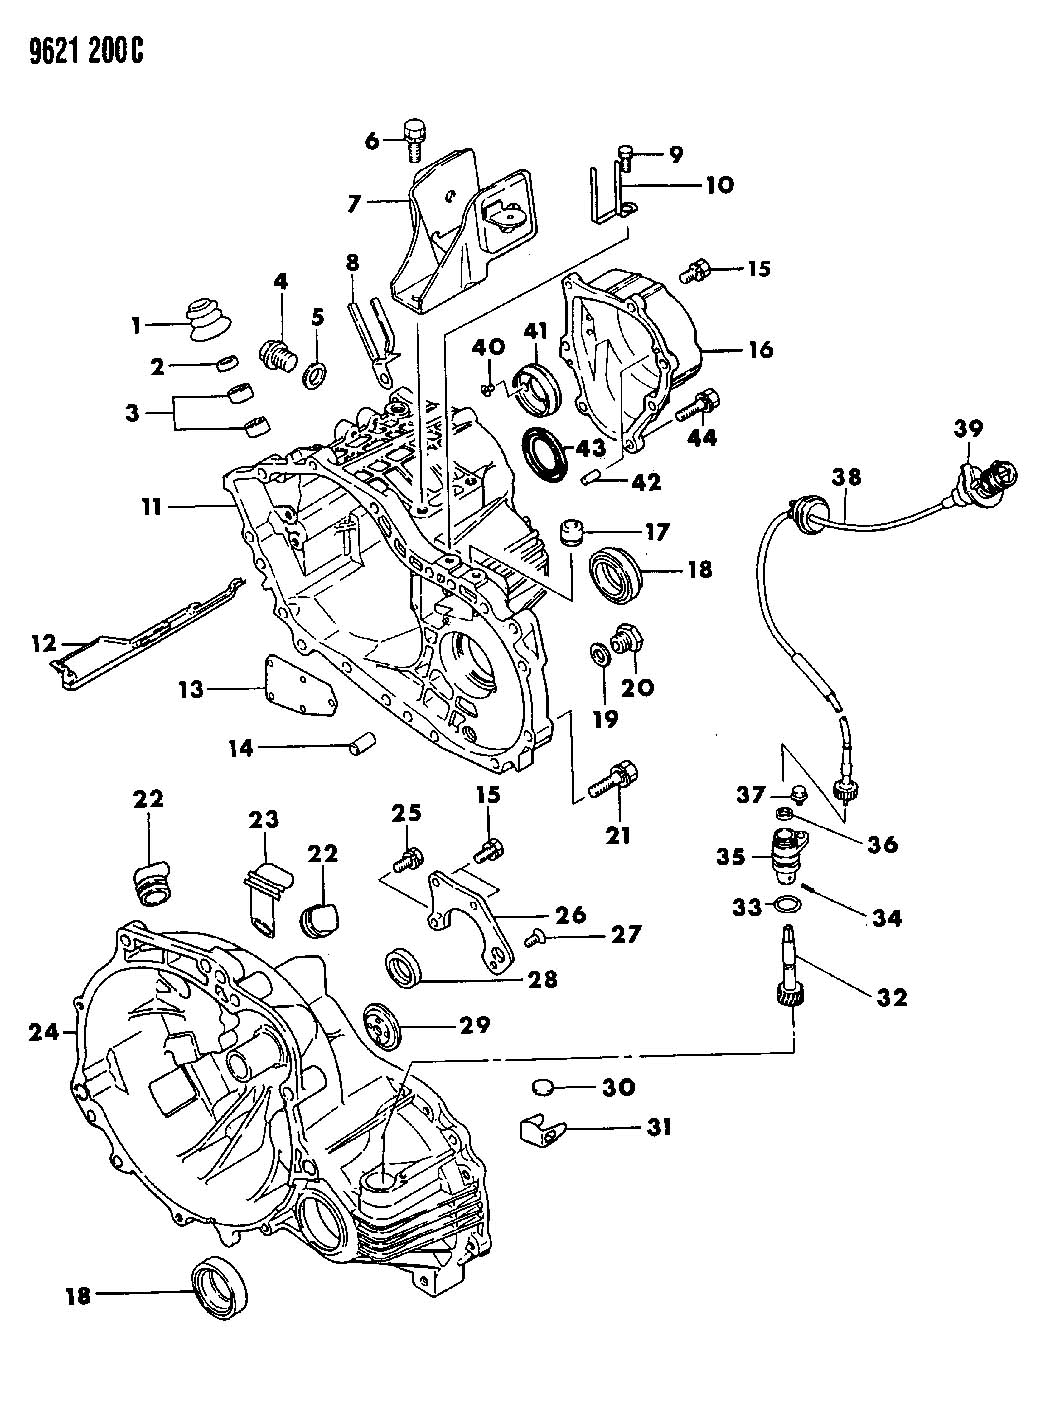 Eagle Talon Clip Wiring 10 5 60 85 10 5 60 85 Engine